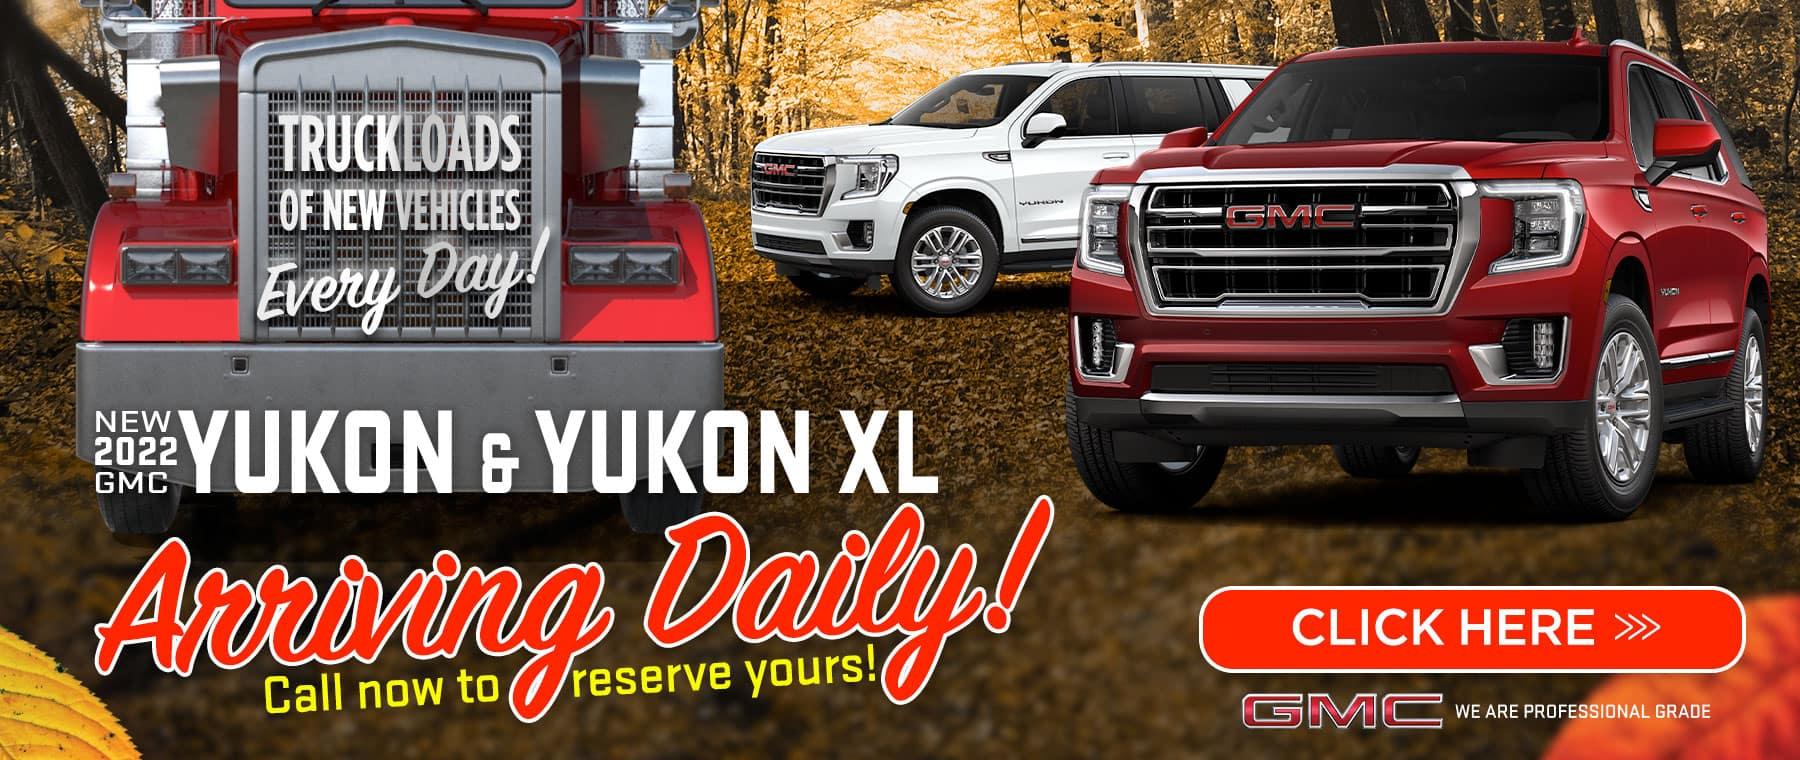 New 2022 Yukon & Yukon XL - Arriving Daily